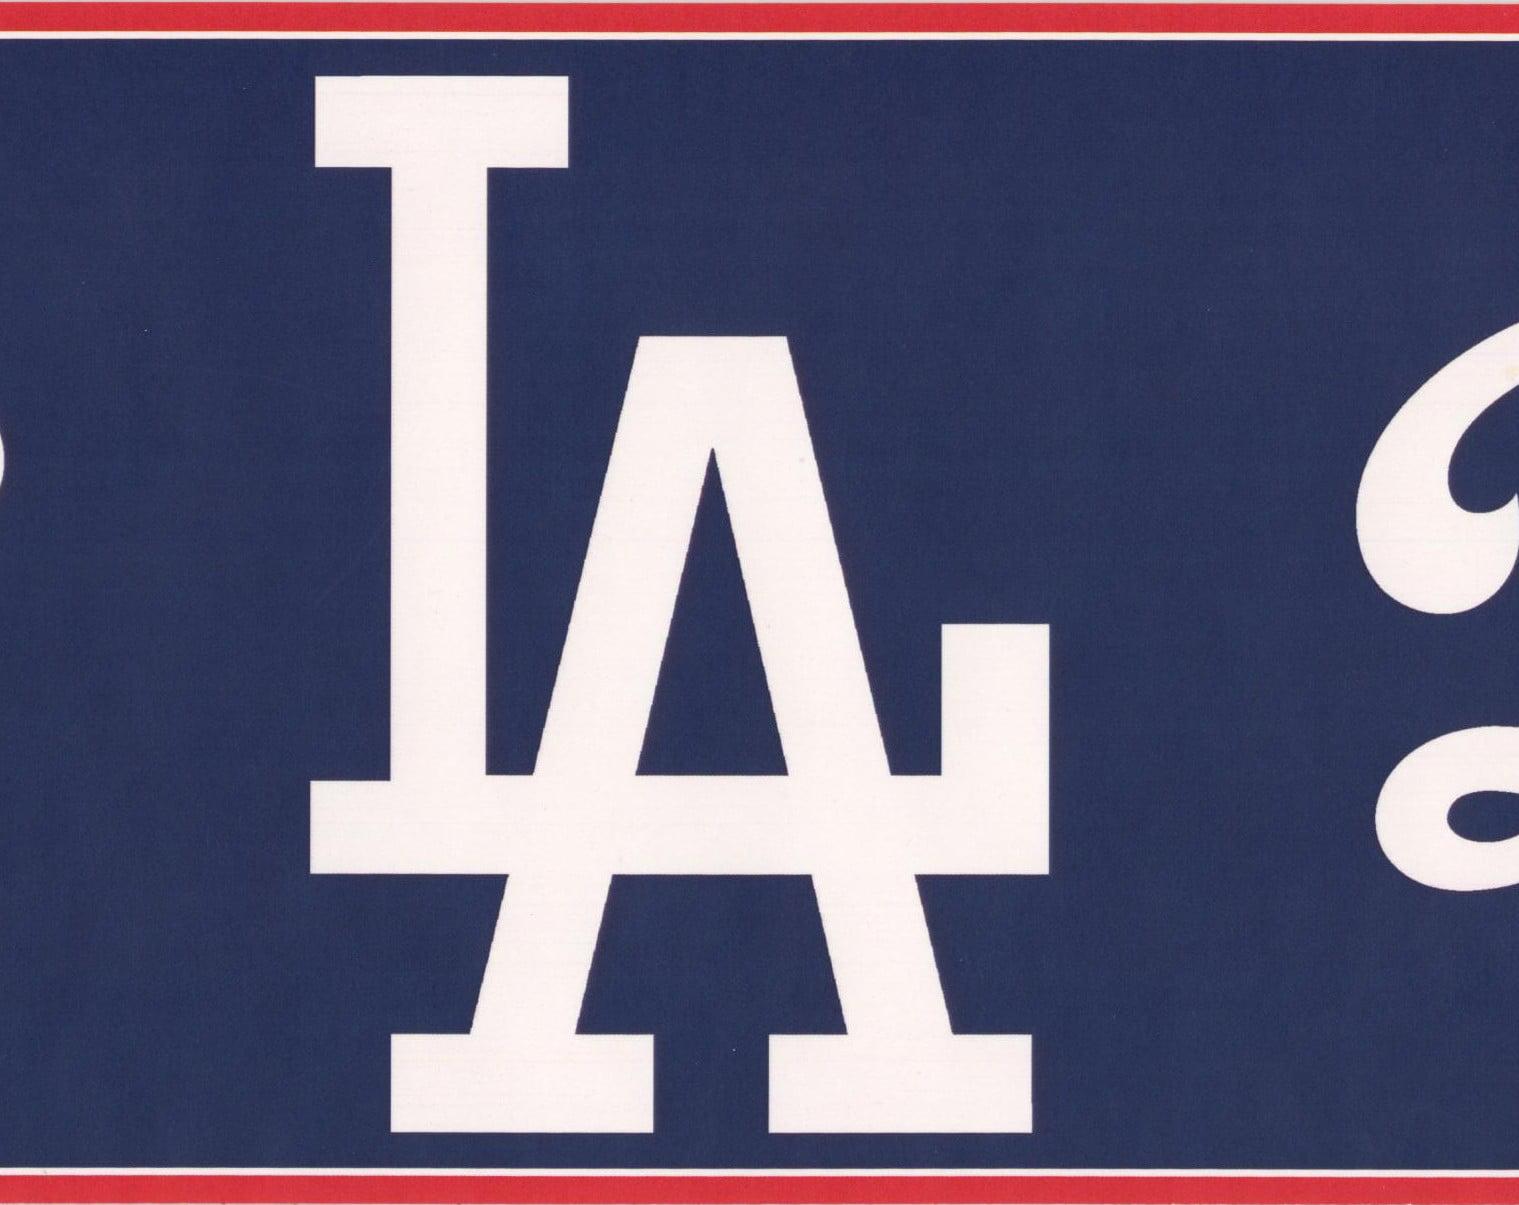 Los Angeles Dodgers Mlb Baseball Team Fan Sports Wallpaper Border